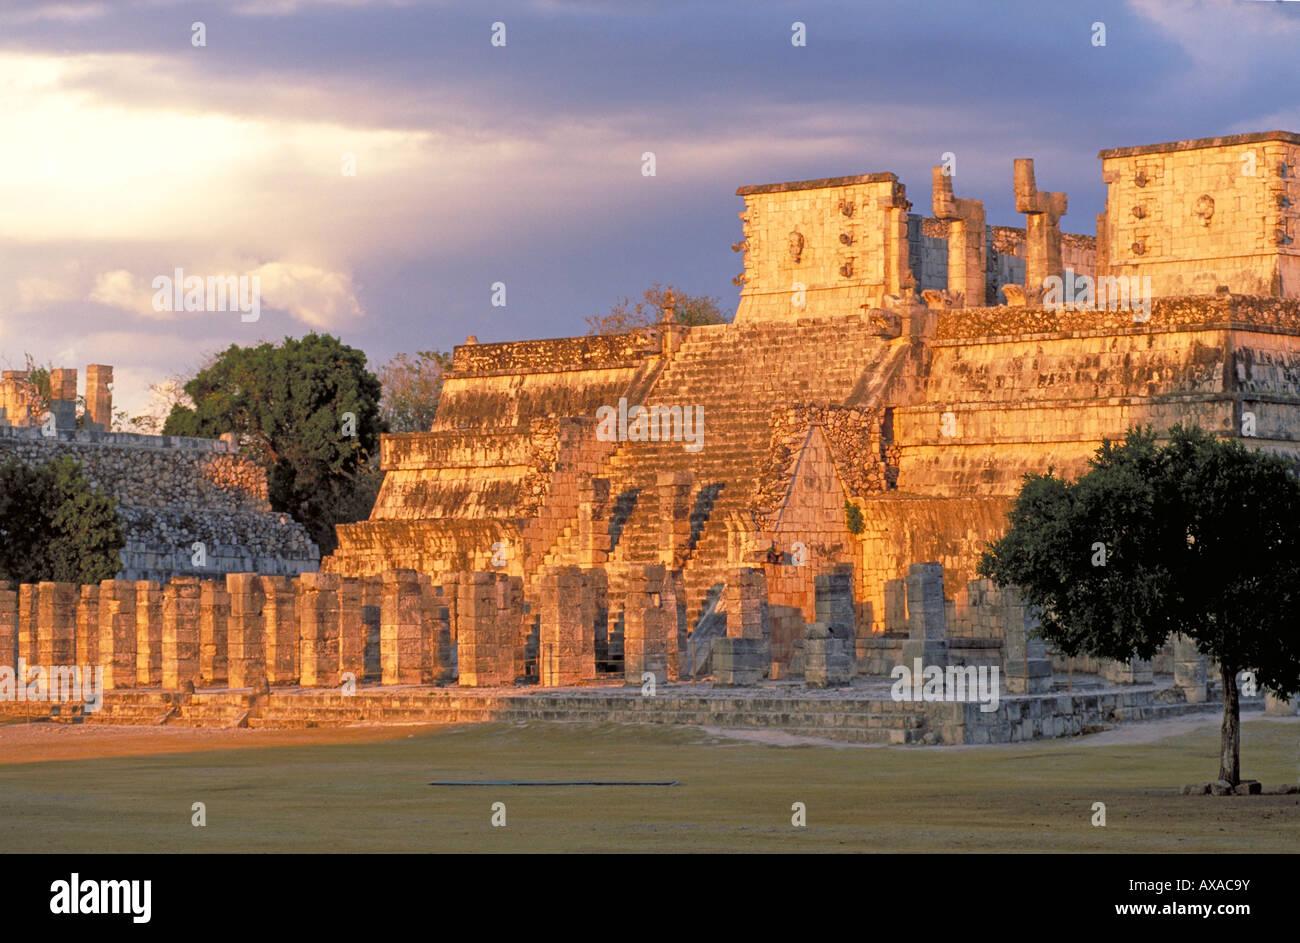 Elk156 1725 Mexico Yucatan Chichen Itza Temple of the Warriors Mayan Post Classic Totlec period 900 1200 - Stock Image